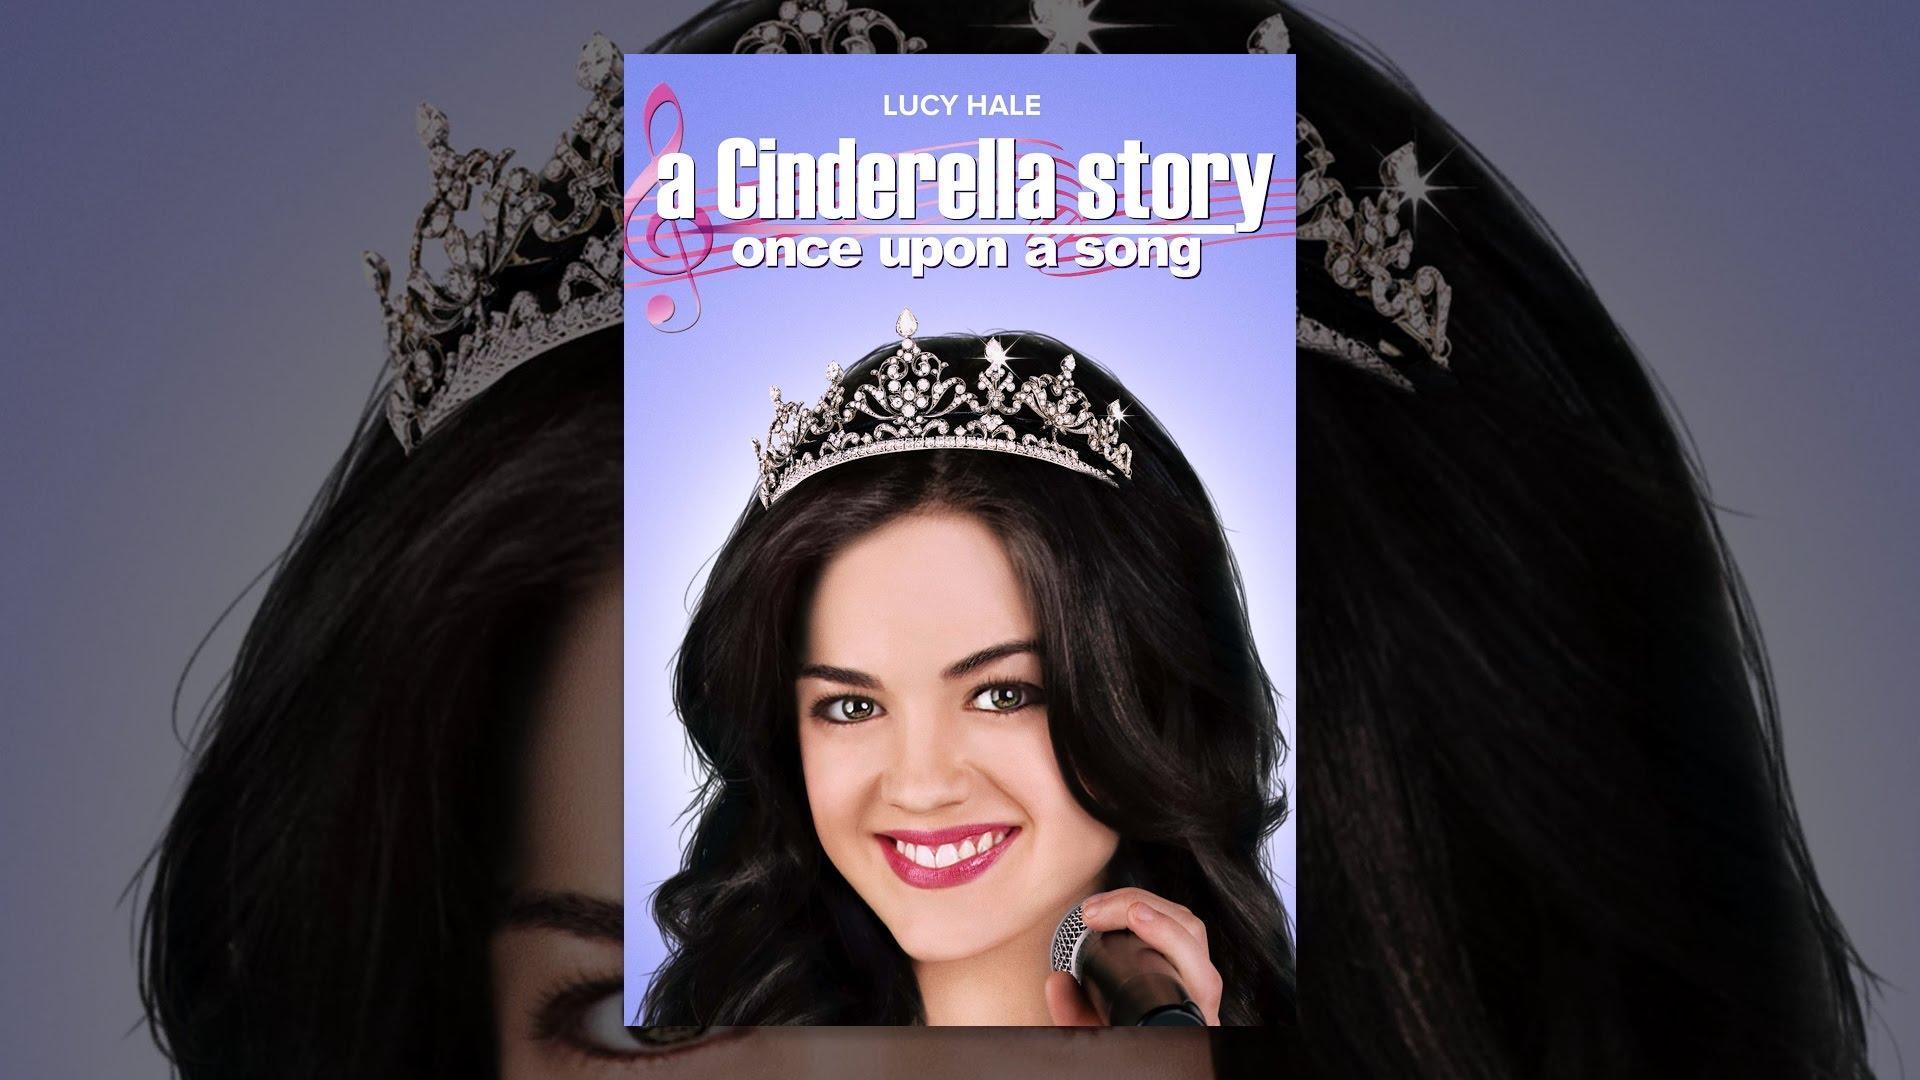 Cinderella Story Actors a Cinderella Story Once Upon